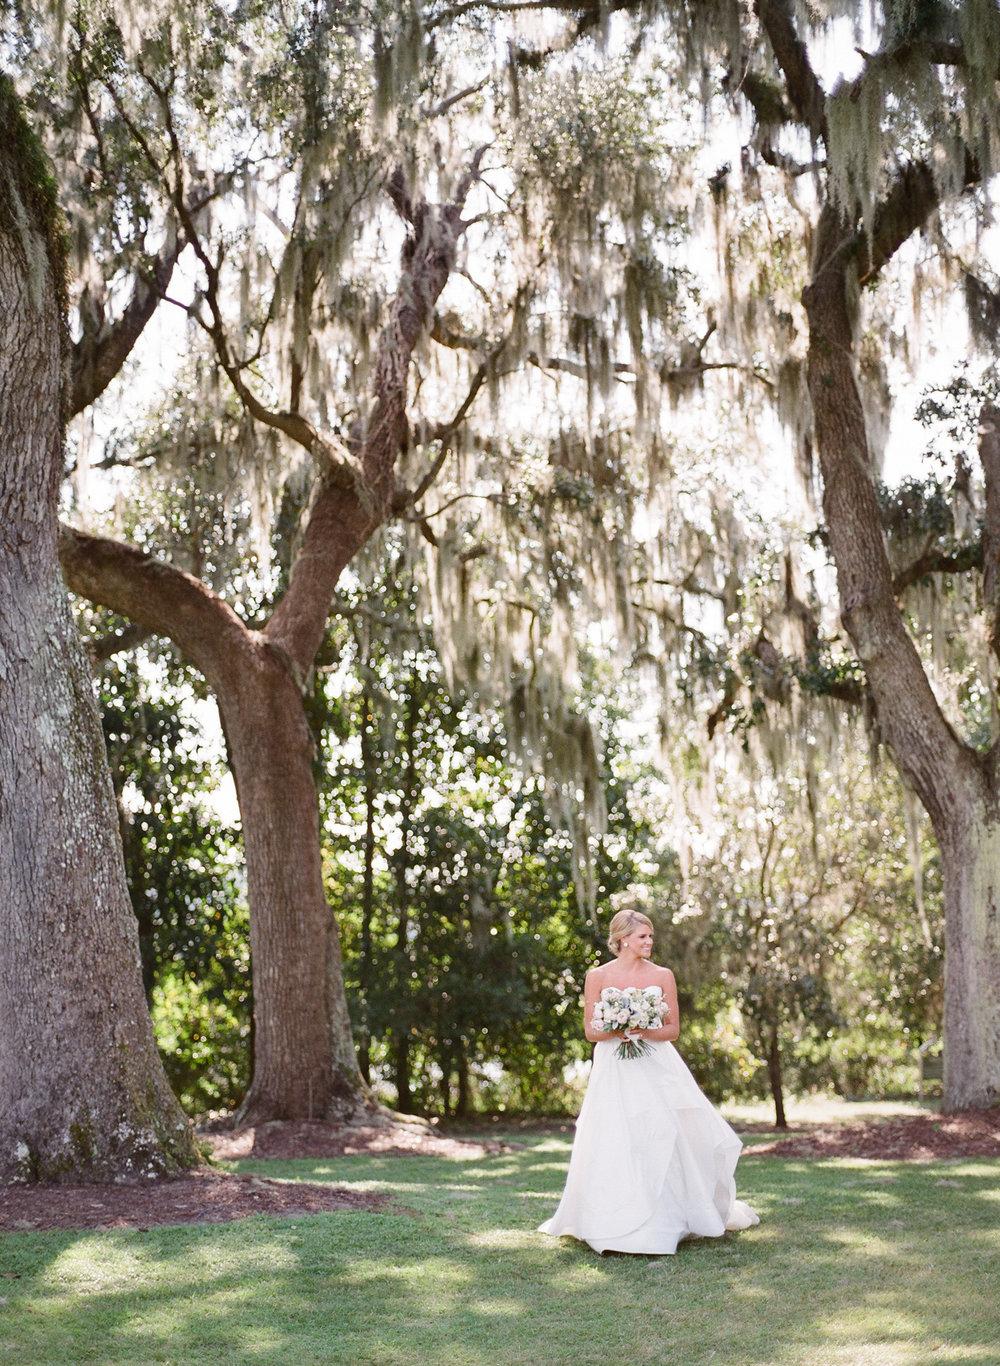 Airlie-Gardens-Wedding-15.jpg